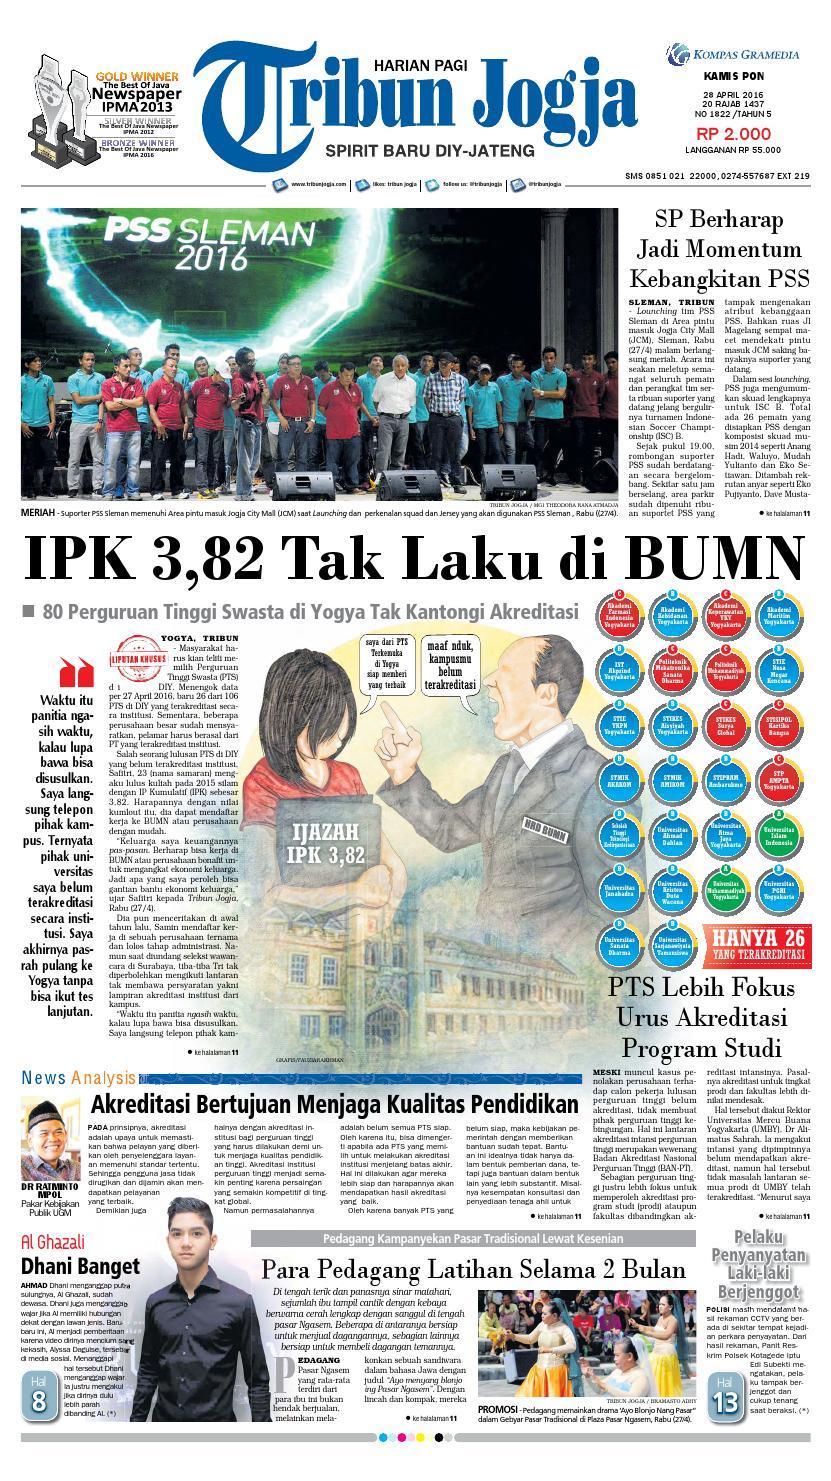 Tribunjogja 28 04 2016 By Tribun Jogja Issuu Produk Ukm Bumn Bale Sehat Teh Rosella Merah 3 Box